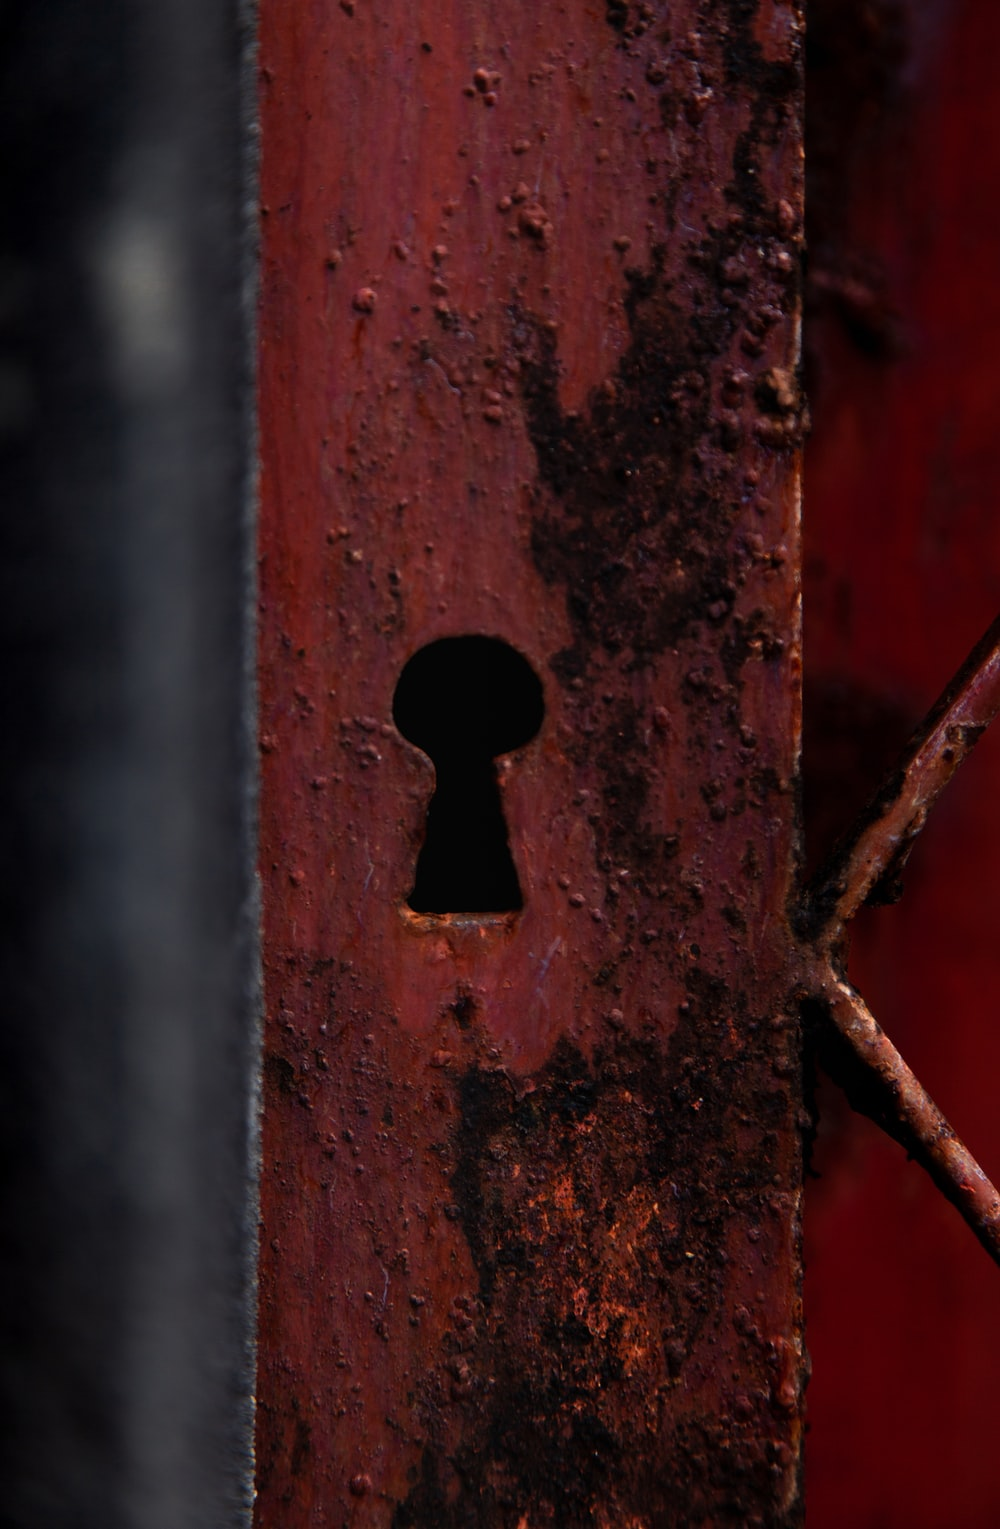 stainless steel lock hole